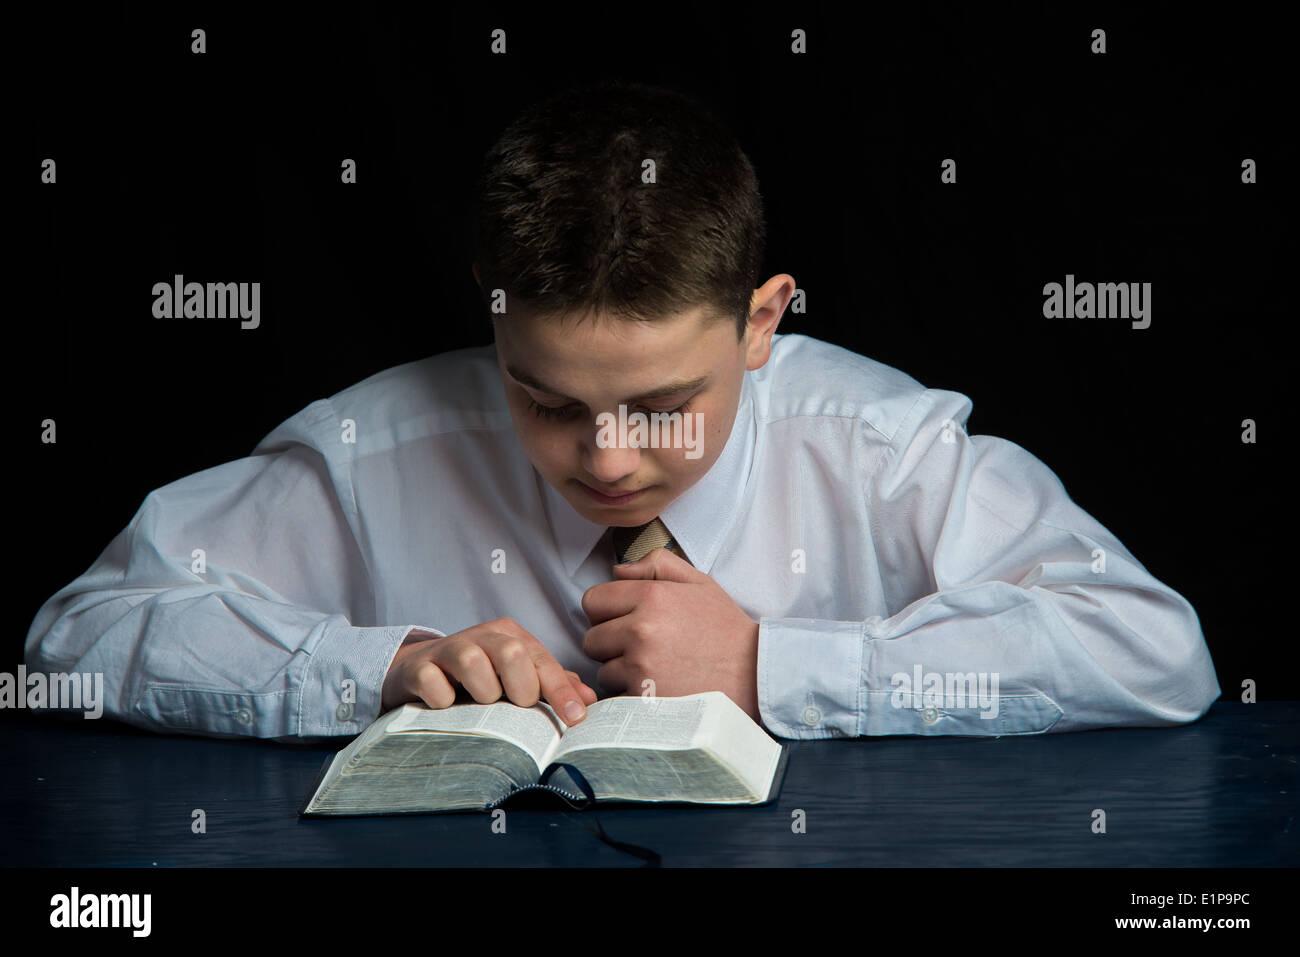 A teenage boy studies the scriptures. - Stock Image